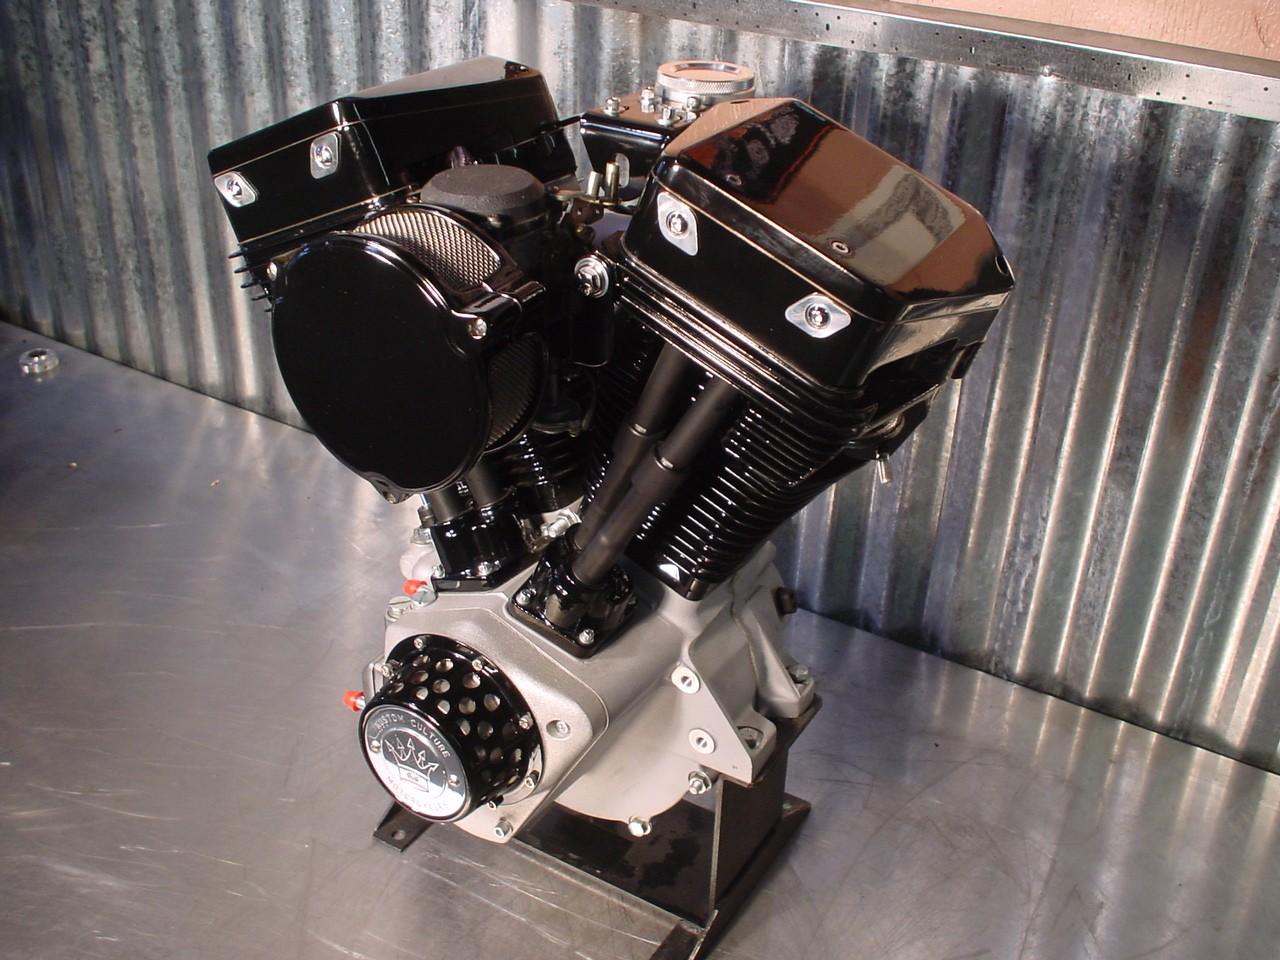 KCM HD Super 80 Evo Engine